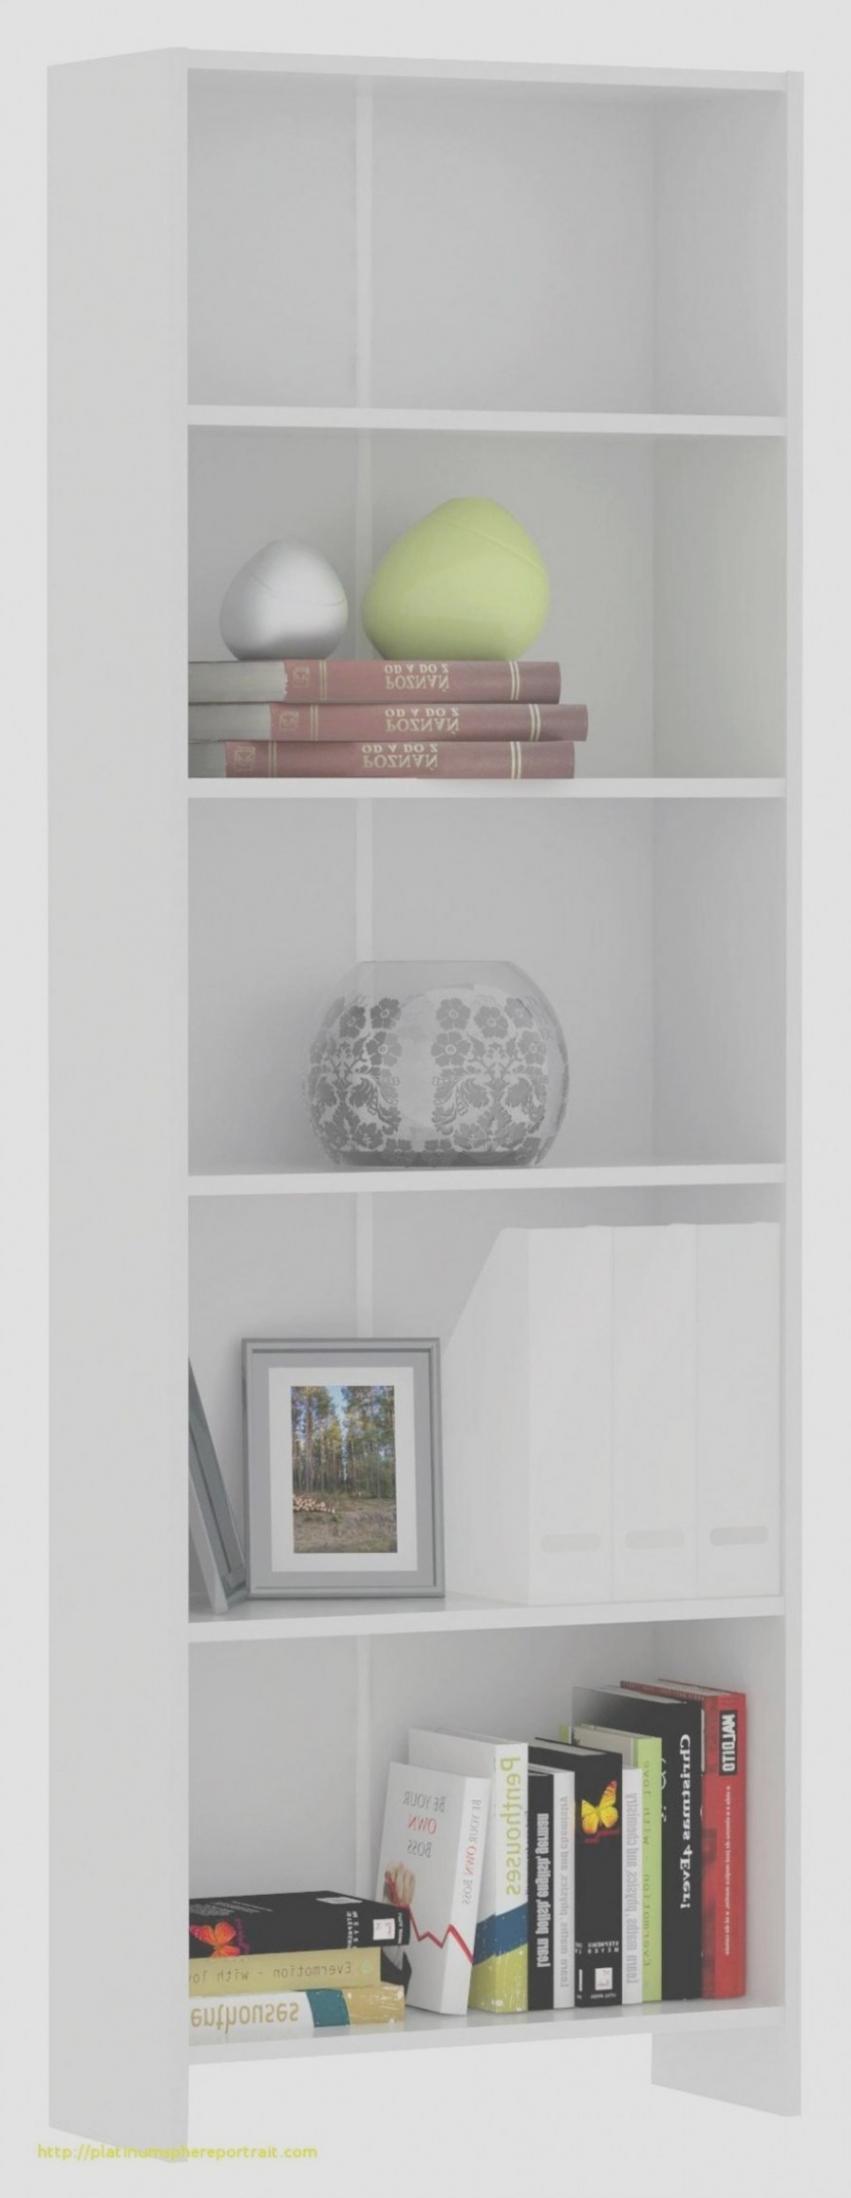 Alte Türen Im Garten Dekorieren Elegant Billy Türen Alternative — Temobardz Home Blog